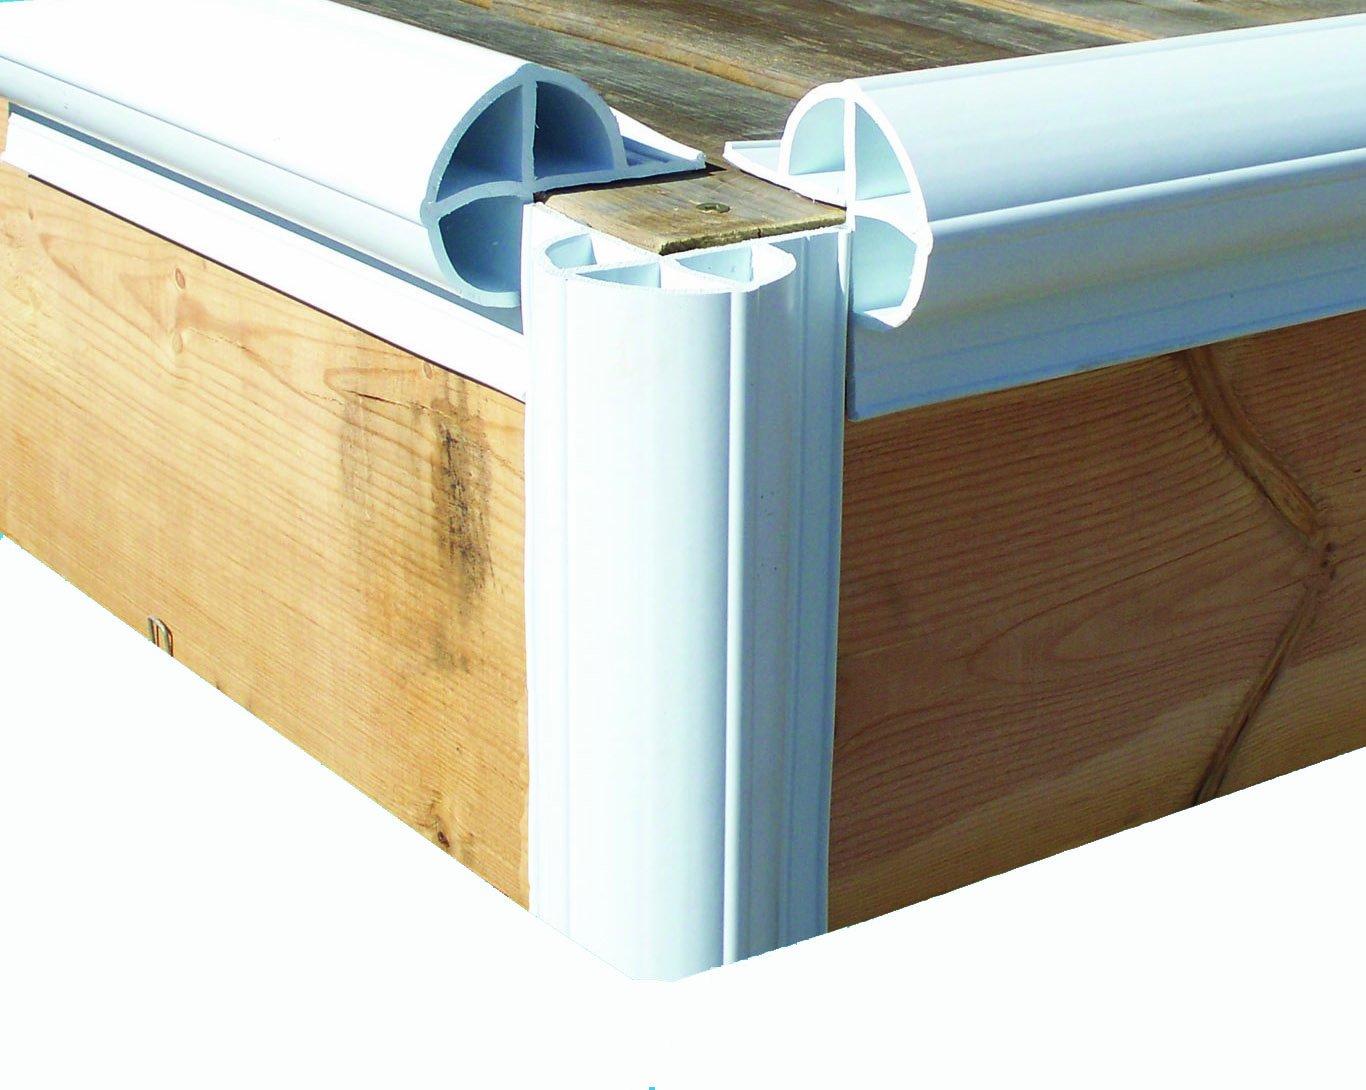 Dock Edge + Inc. Premium PVC Dock Bumper Corner Edge Profile, 6-8-Feet Sections (48-Feet, White), Pack of 6